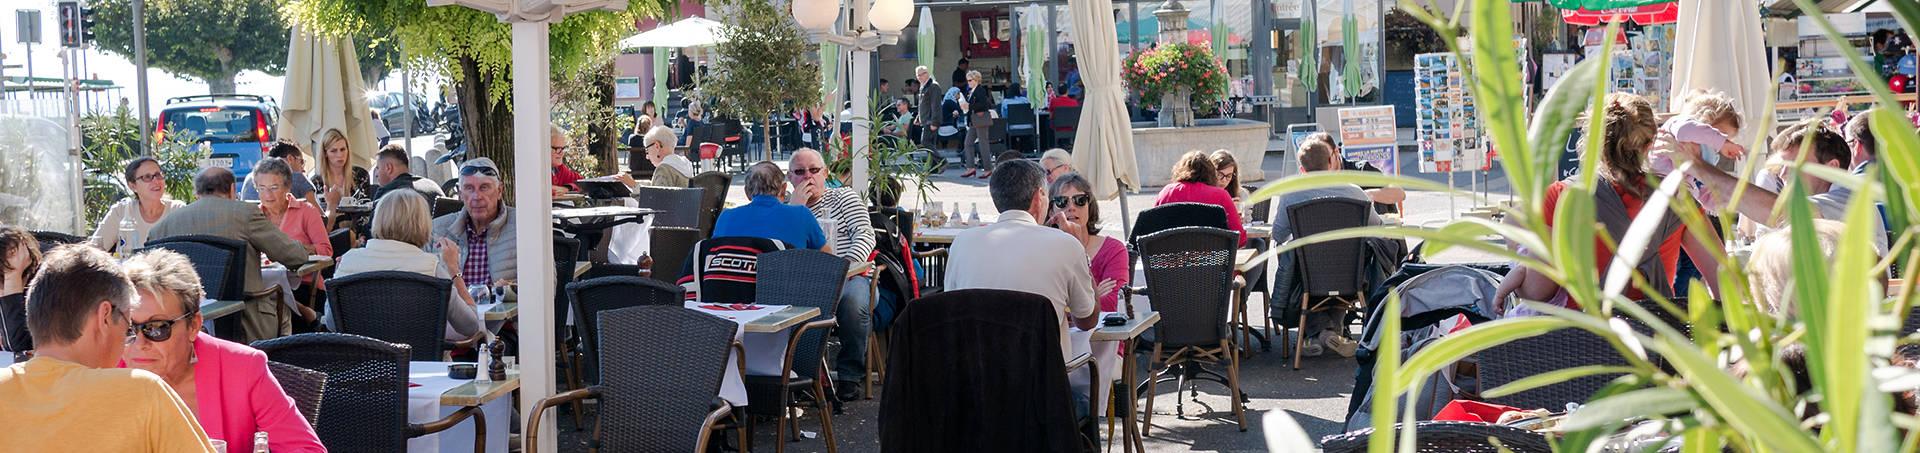 Terrasse Restaurant Le Léman Nyon